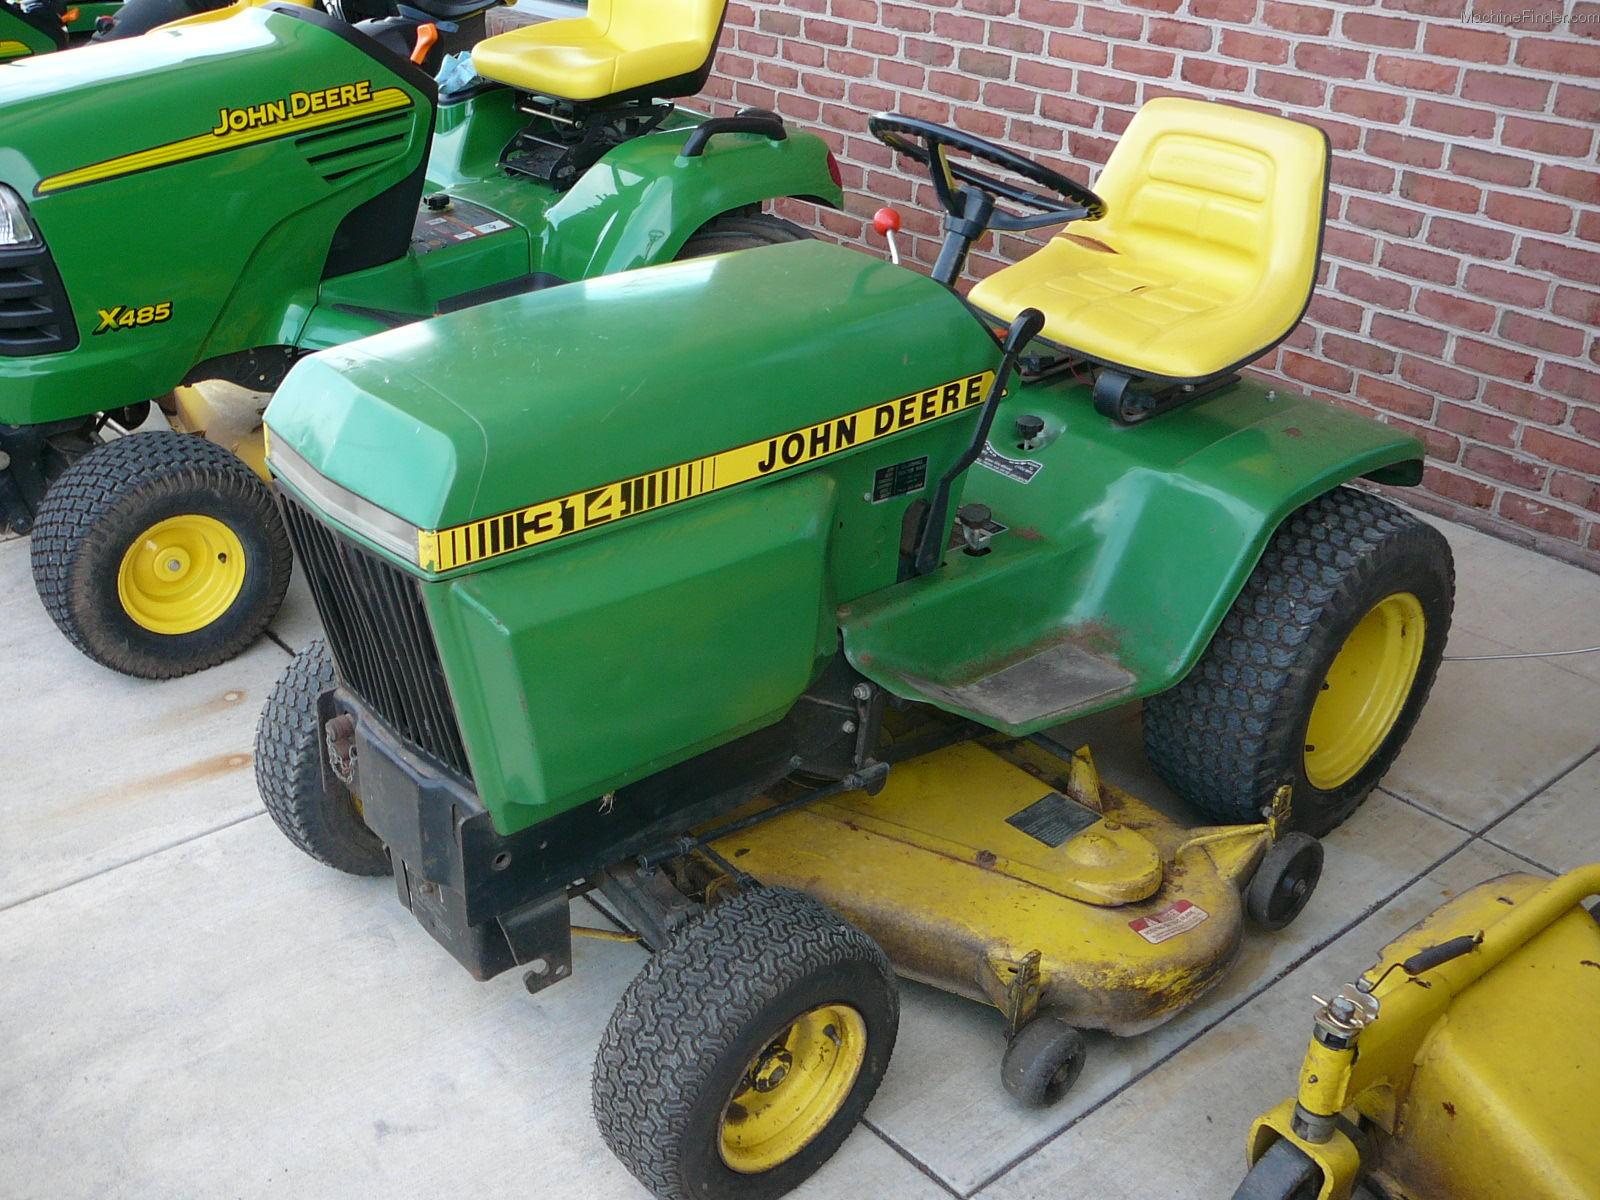 garden ca tractor en diy utility parts lawn deere tractors john service compact support